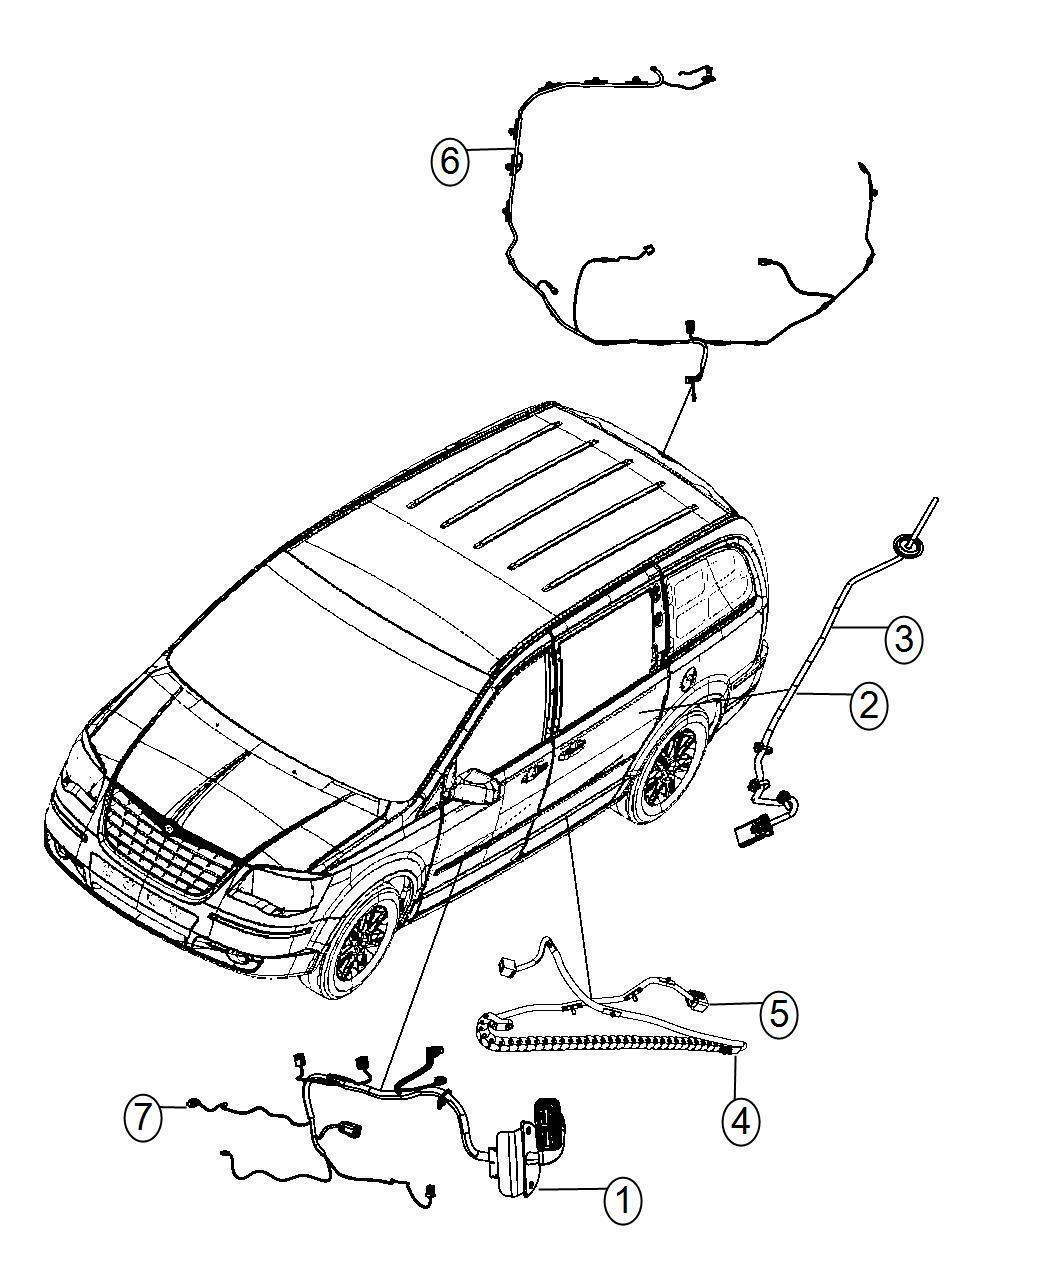 Ram C/V Wiring. Sliding door track. Right. One, driver